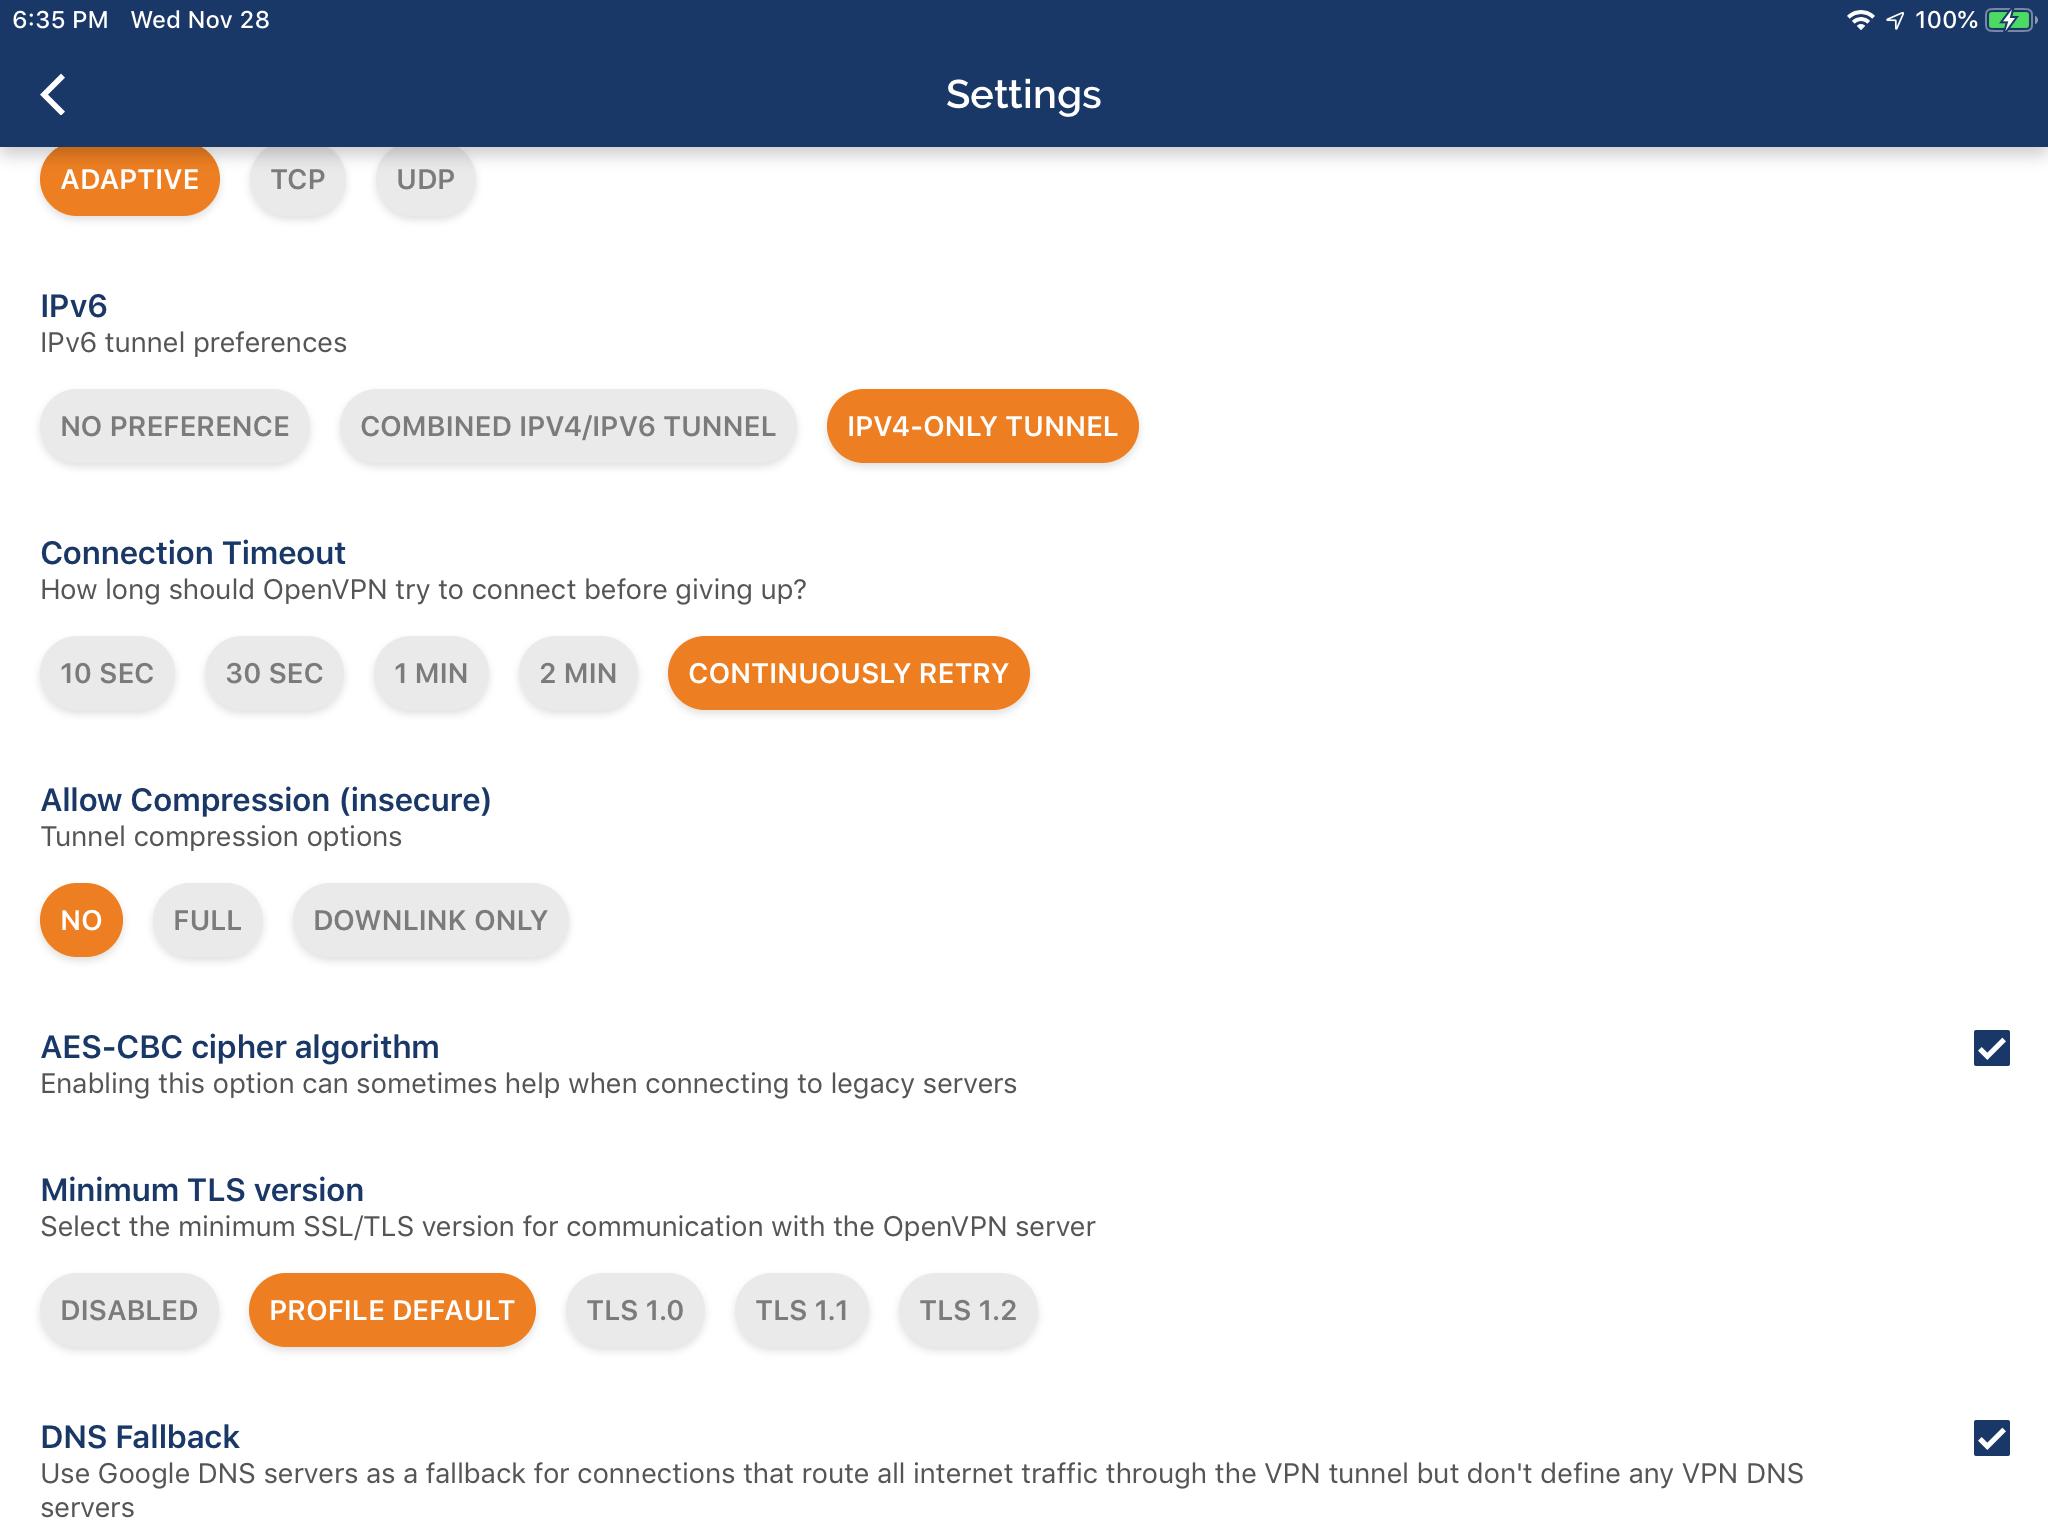 OpenVPN on IOS 12 x fails to Connect to PiVPN   Wondernerd net